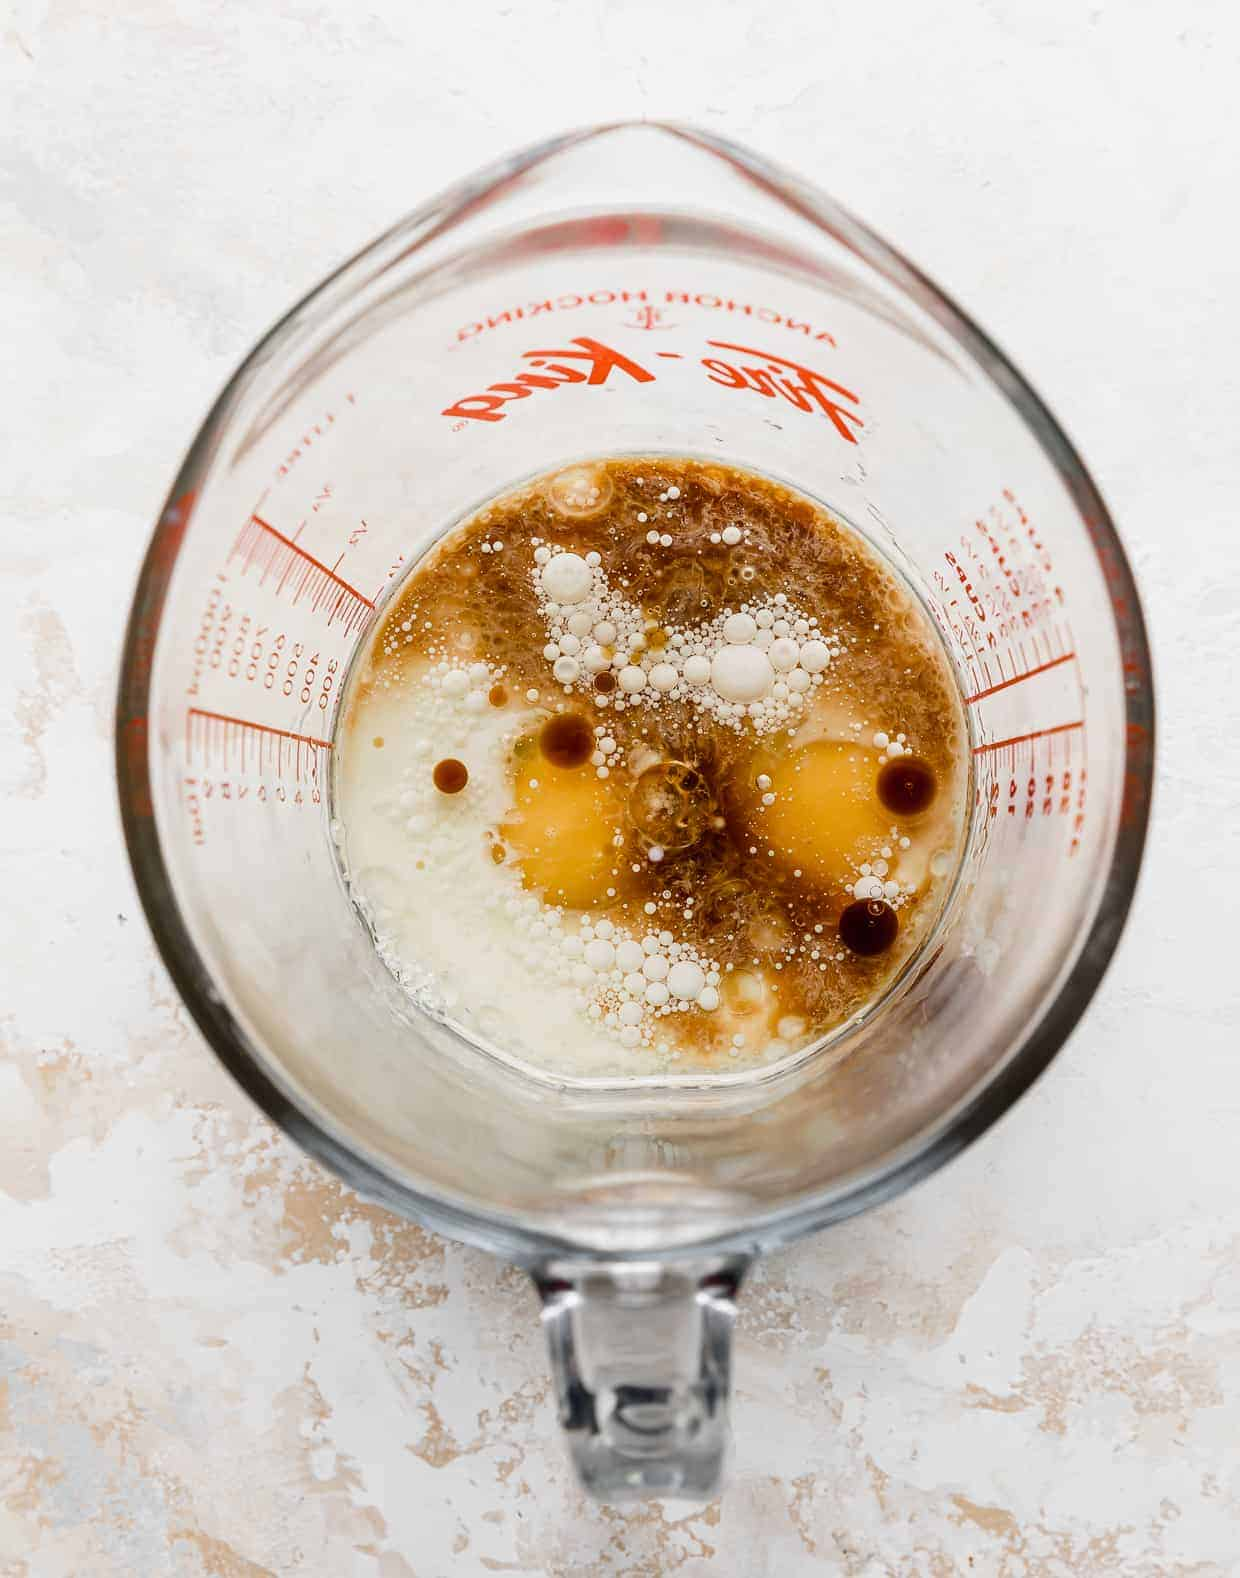 A liquid measuring cup with eggs, vanilla, buttermilk in it.